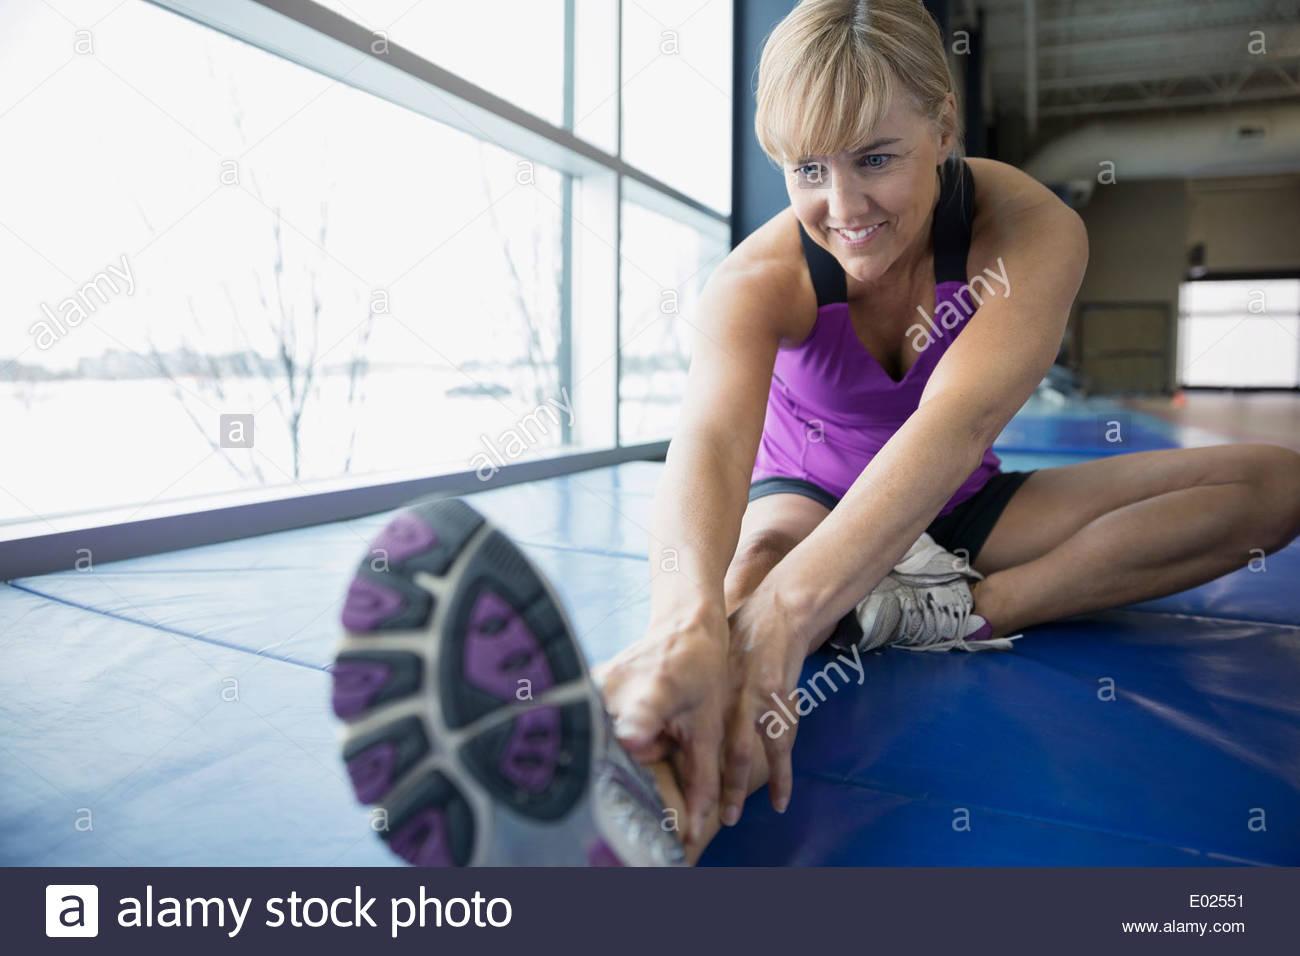 Woman stretching leg at gym - Stock Image